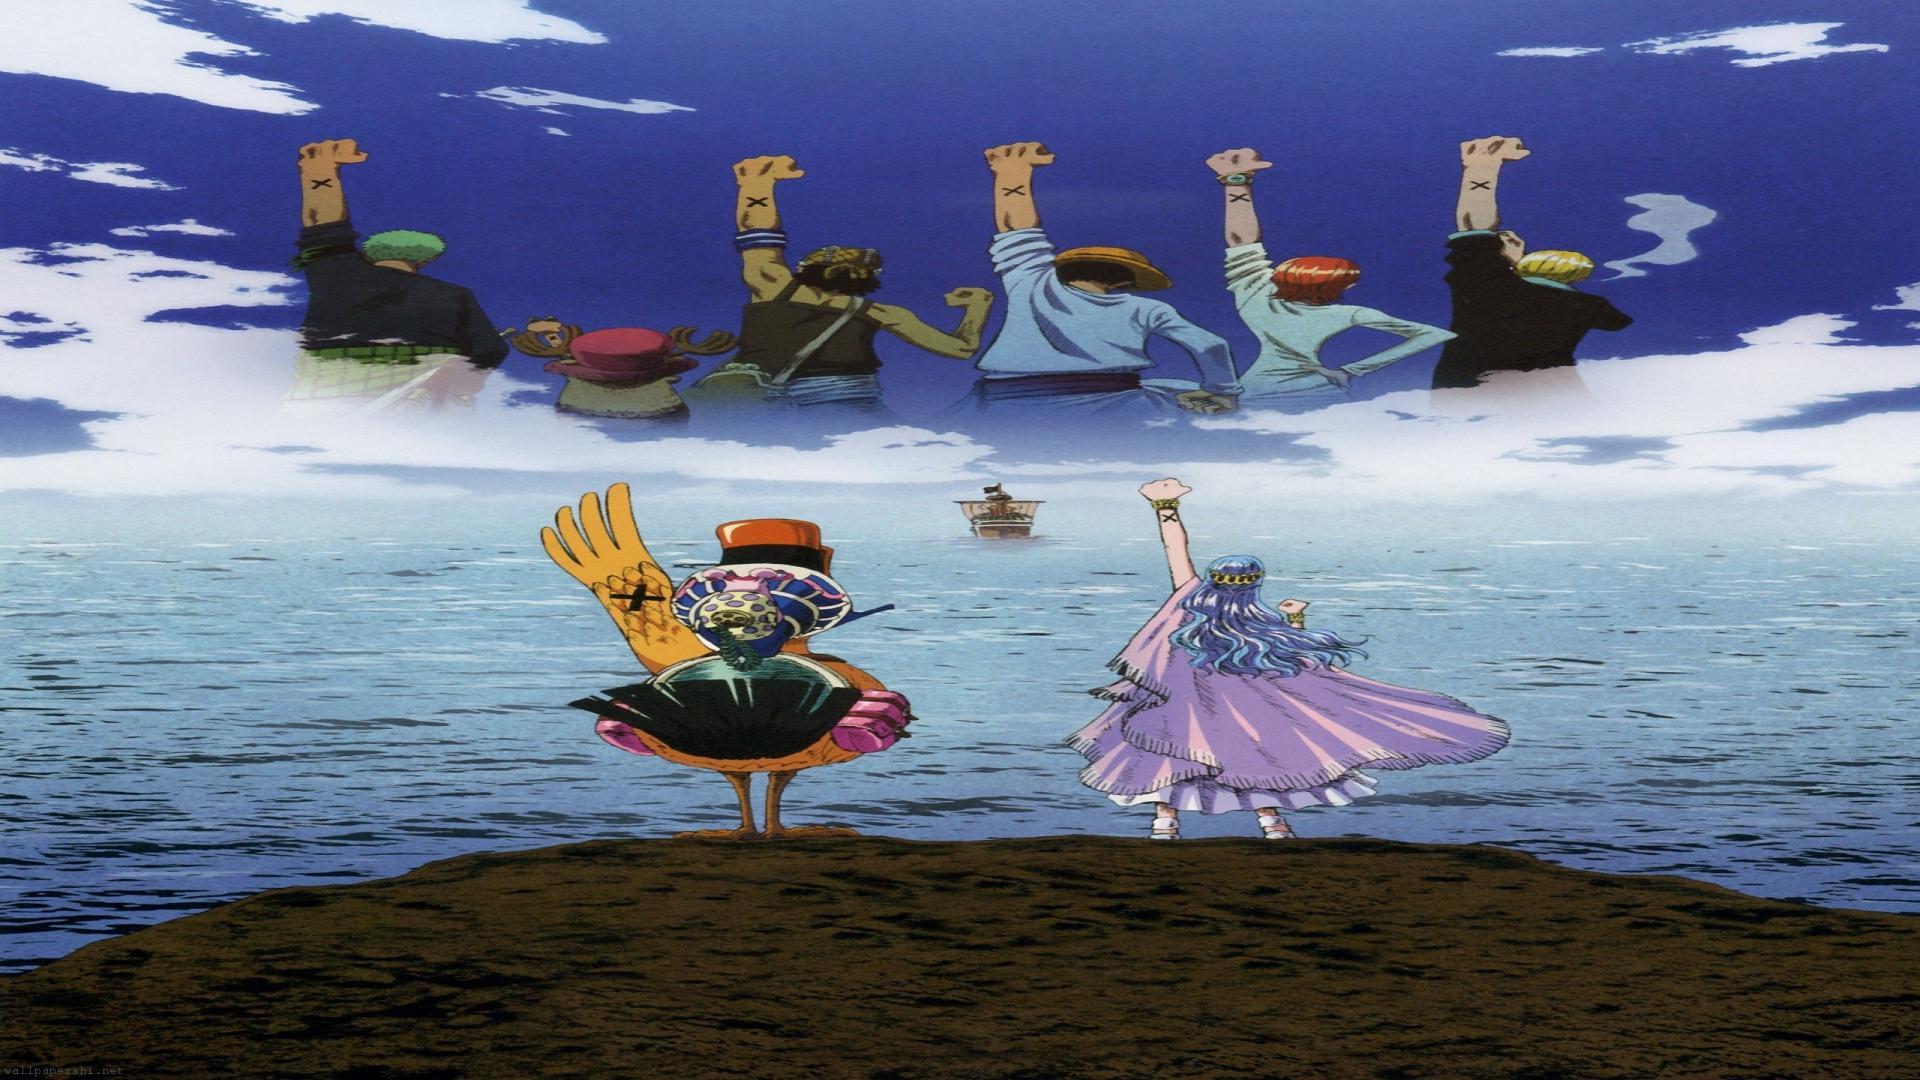 One Piece Nakama HD wallpaper